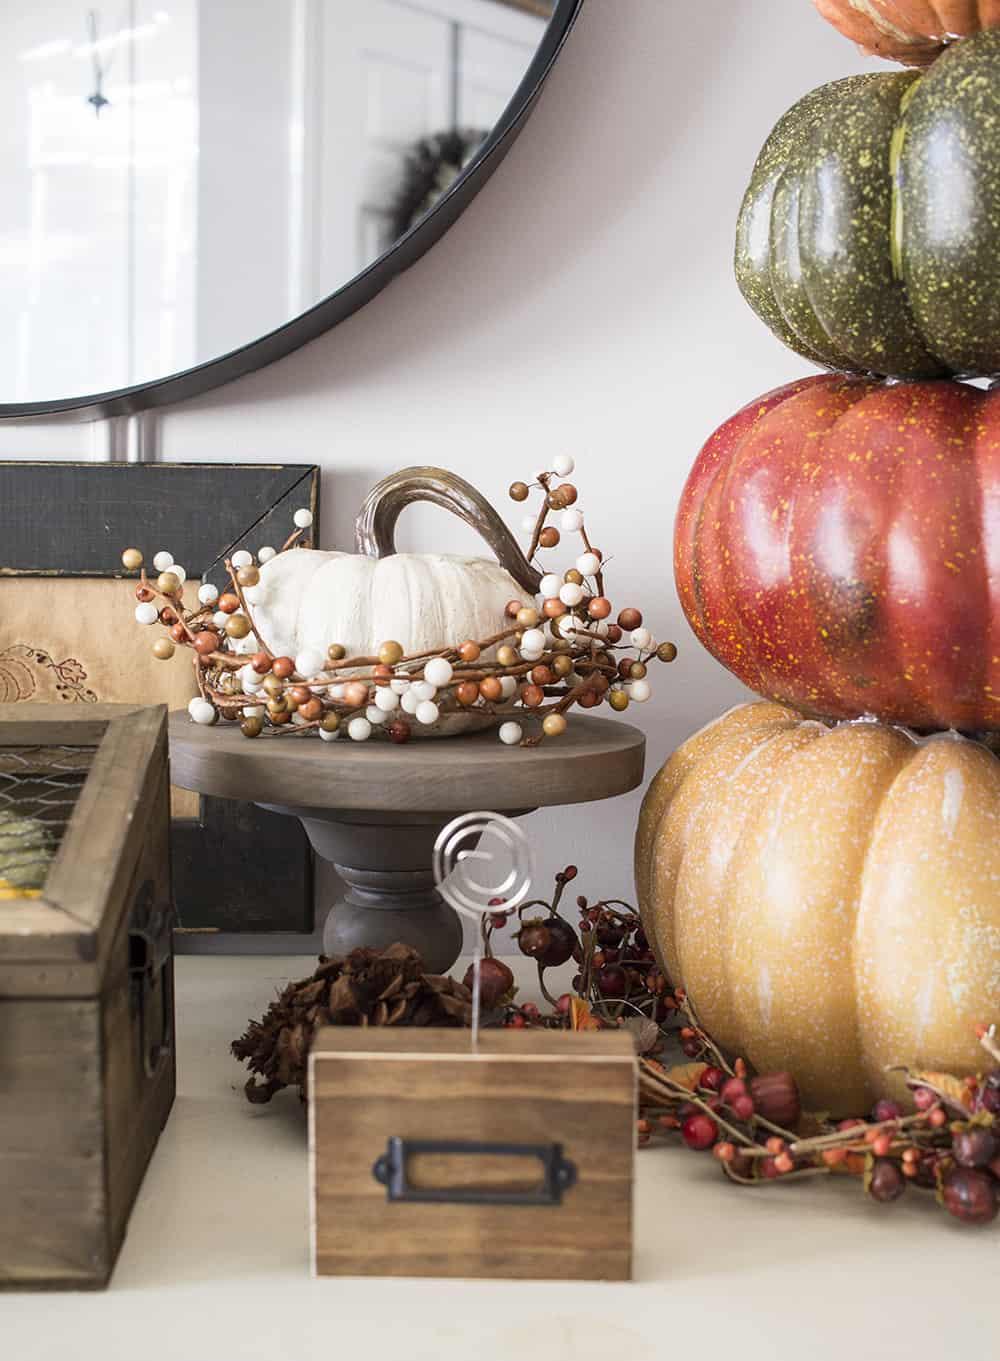 white pumpkin on cake stand